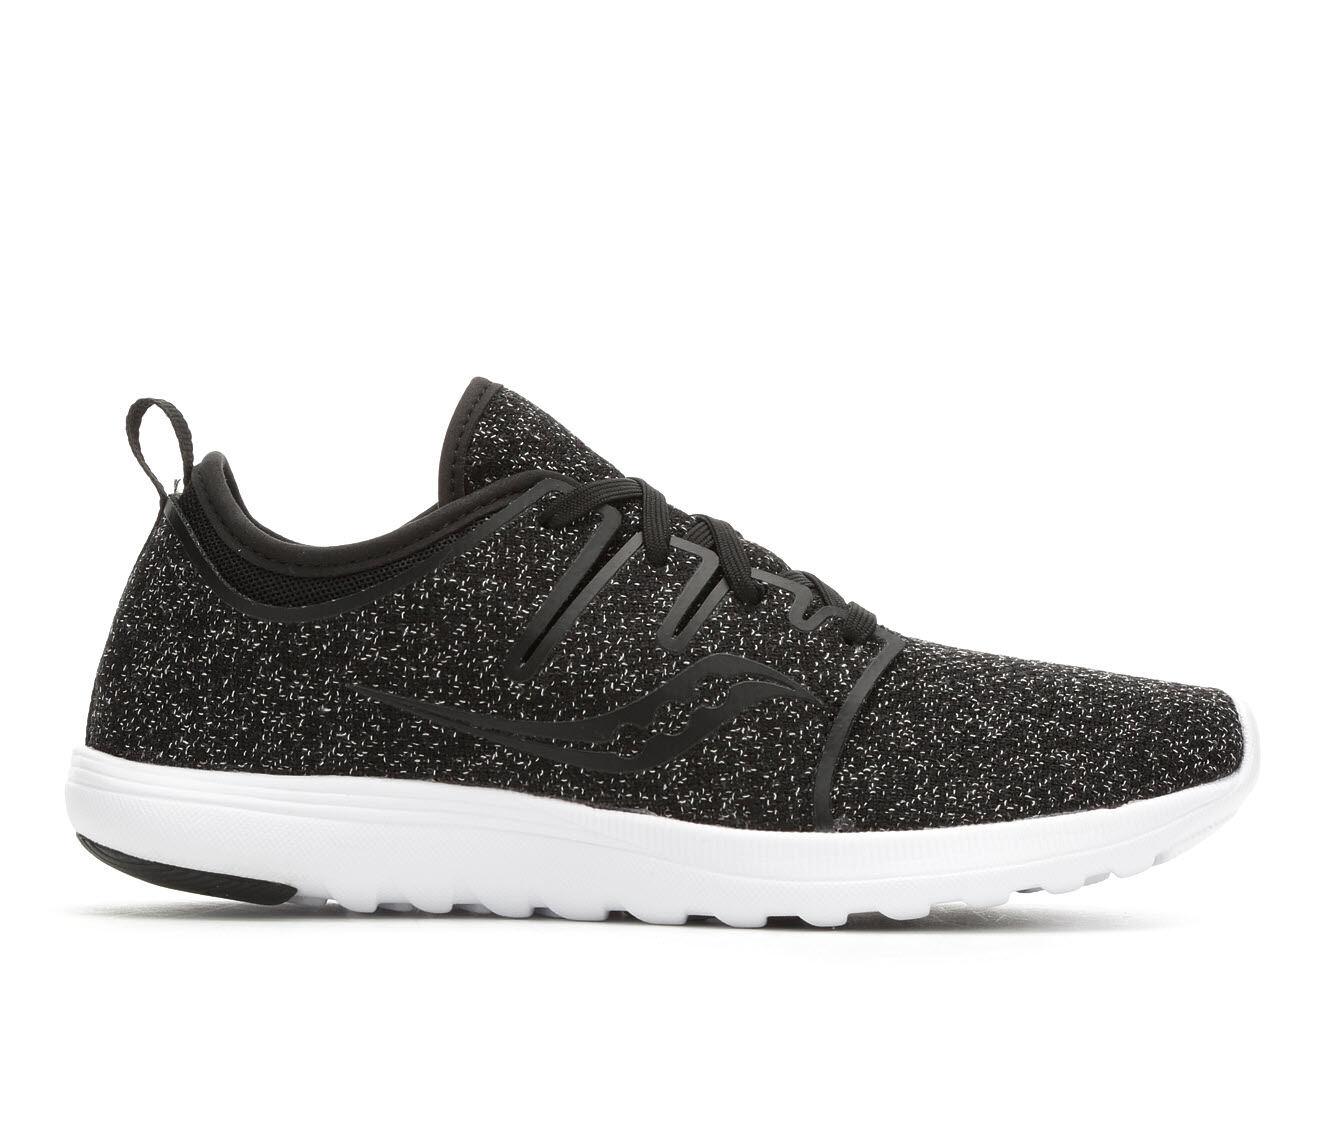 Women's Saucony Eros Lace Sneakers Black Speckl/Wh